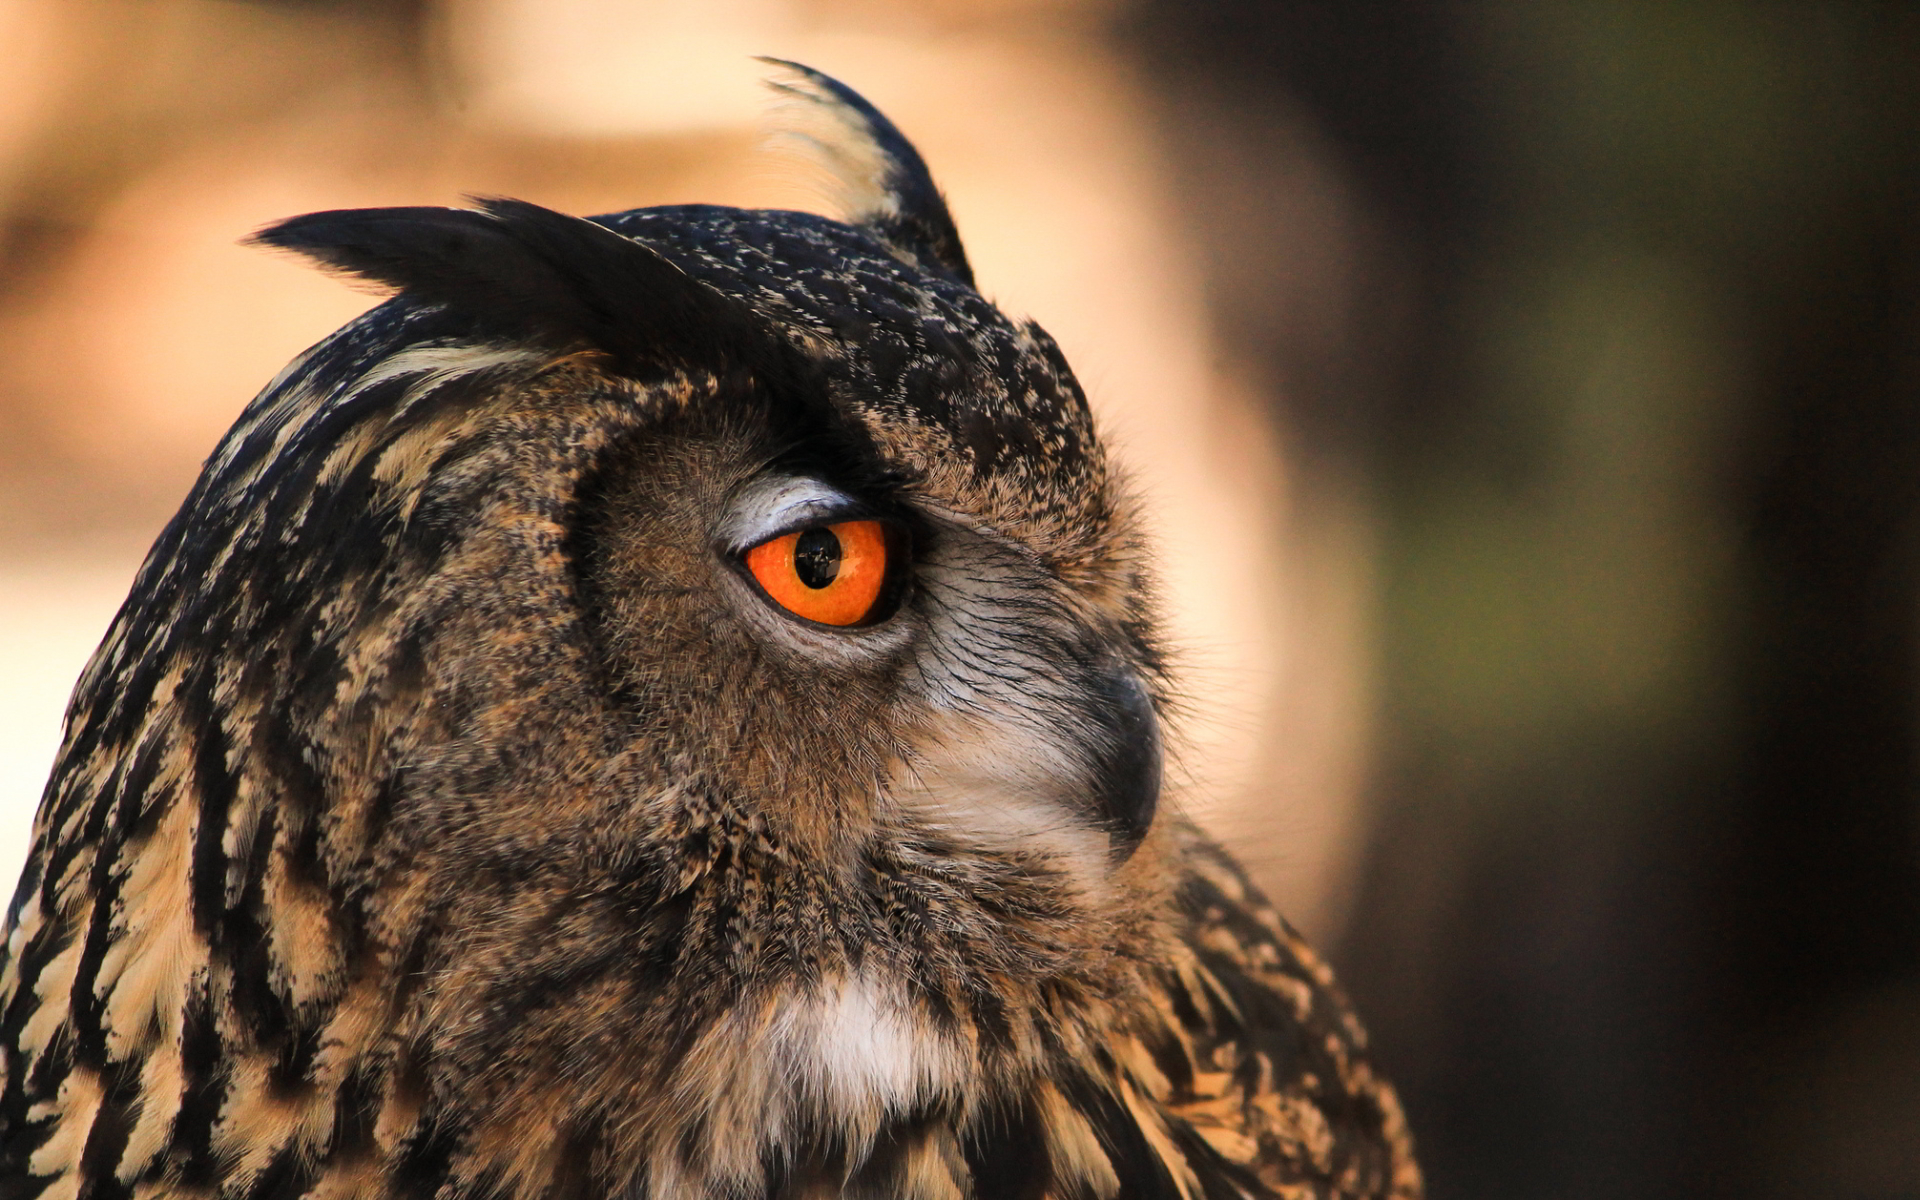 black and white owl wallpaper - HD Desktop Wallpapers   4k HD